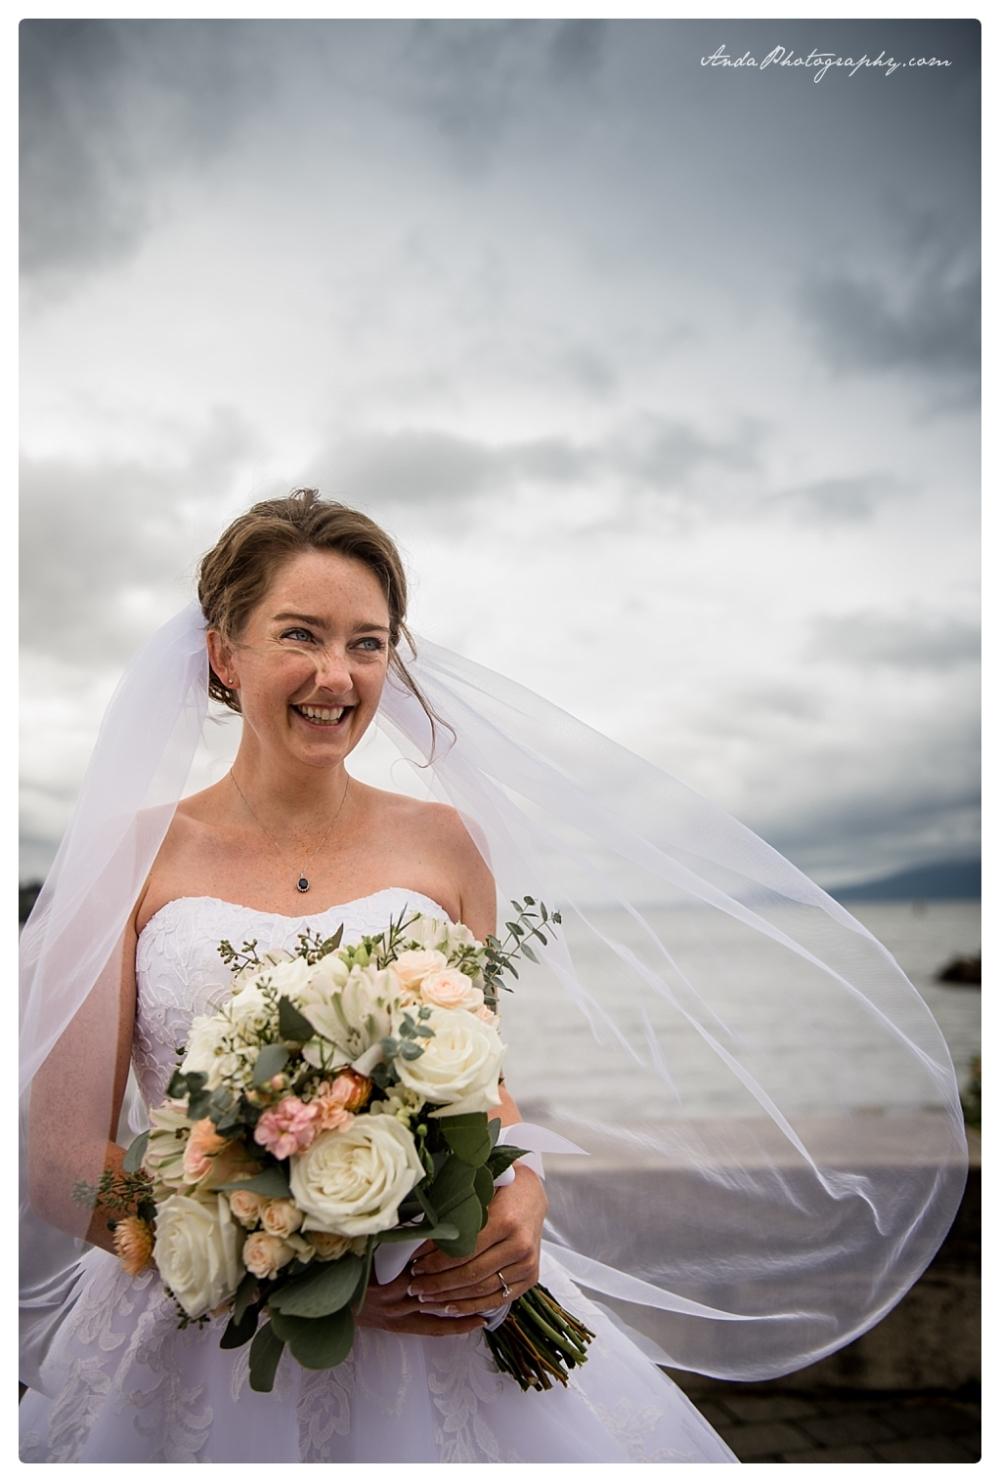 Anda Photography Bellingham wedding photographer Bellingham Yacht Club Wedding lifestyle wedding photographer Seattle Wedding Photographer_0053